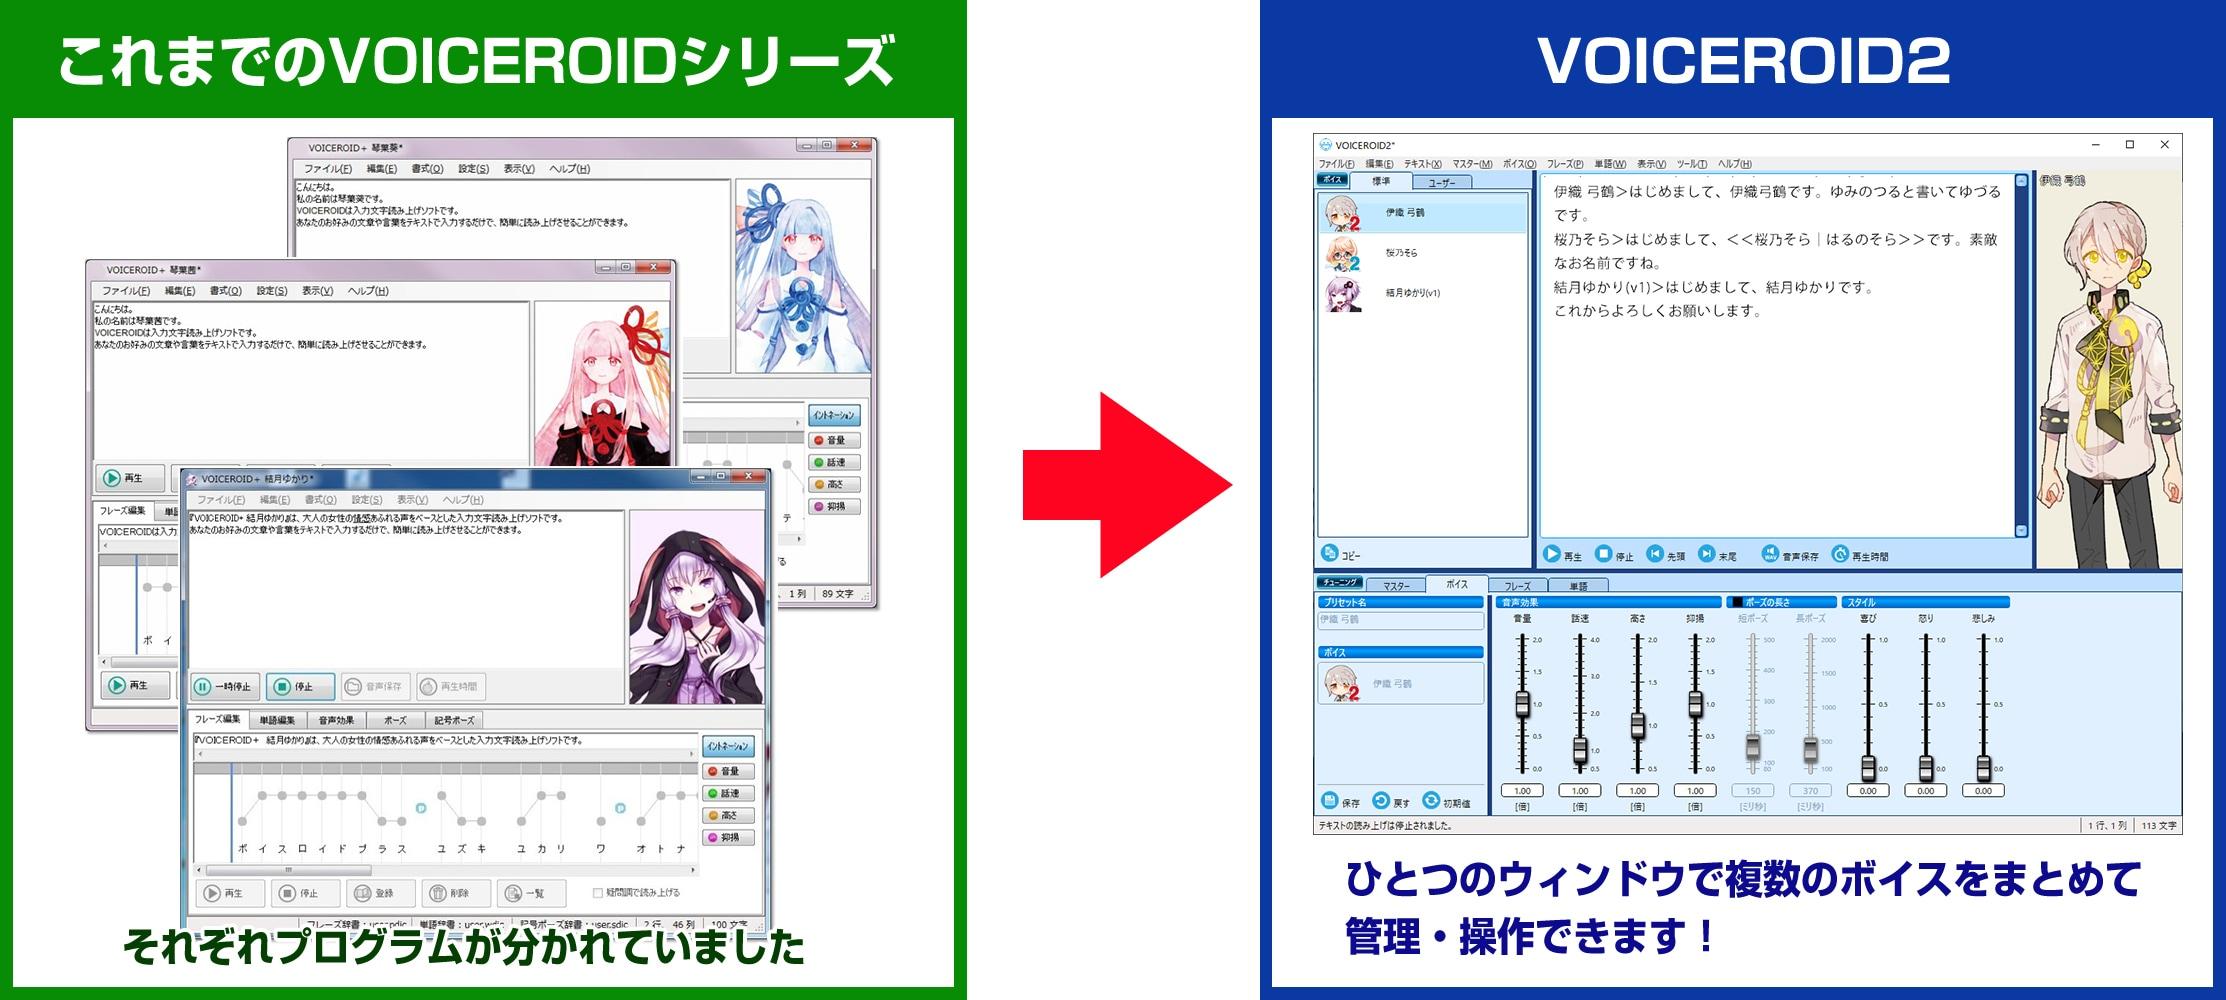 「VOICEROID2 伊織弓鶴」エディター画面イメージ